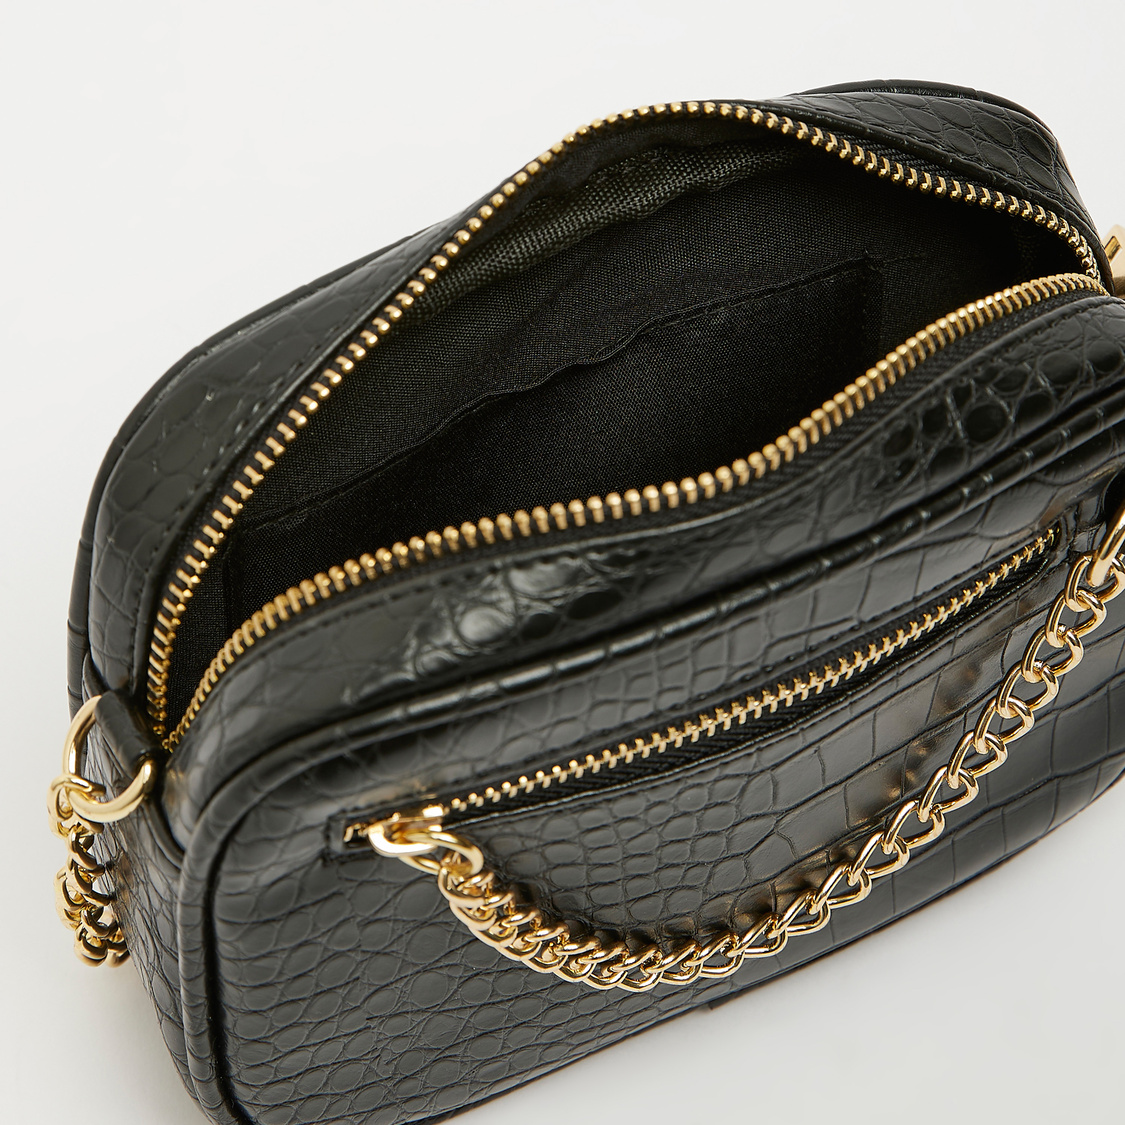 Reptilian Textured Crossbody Bag